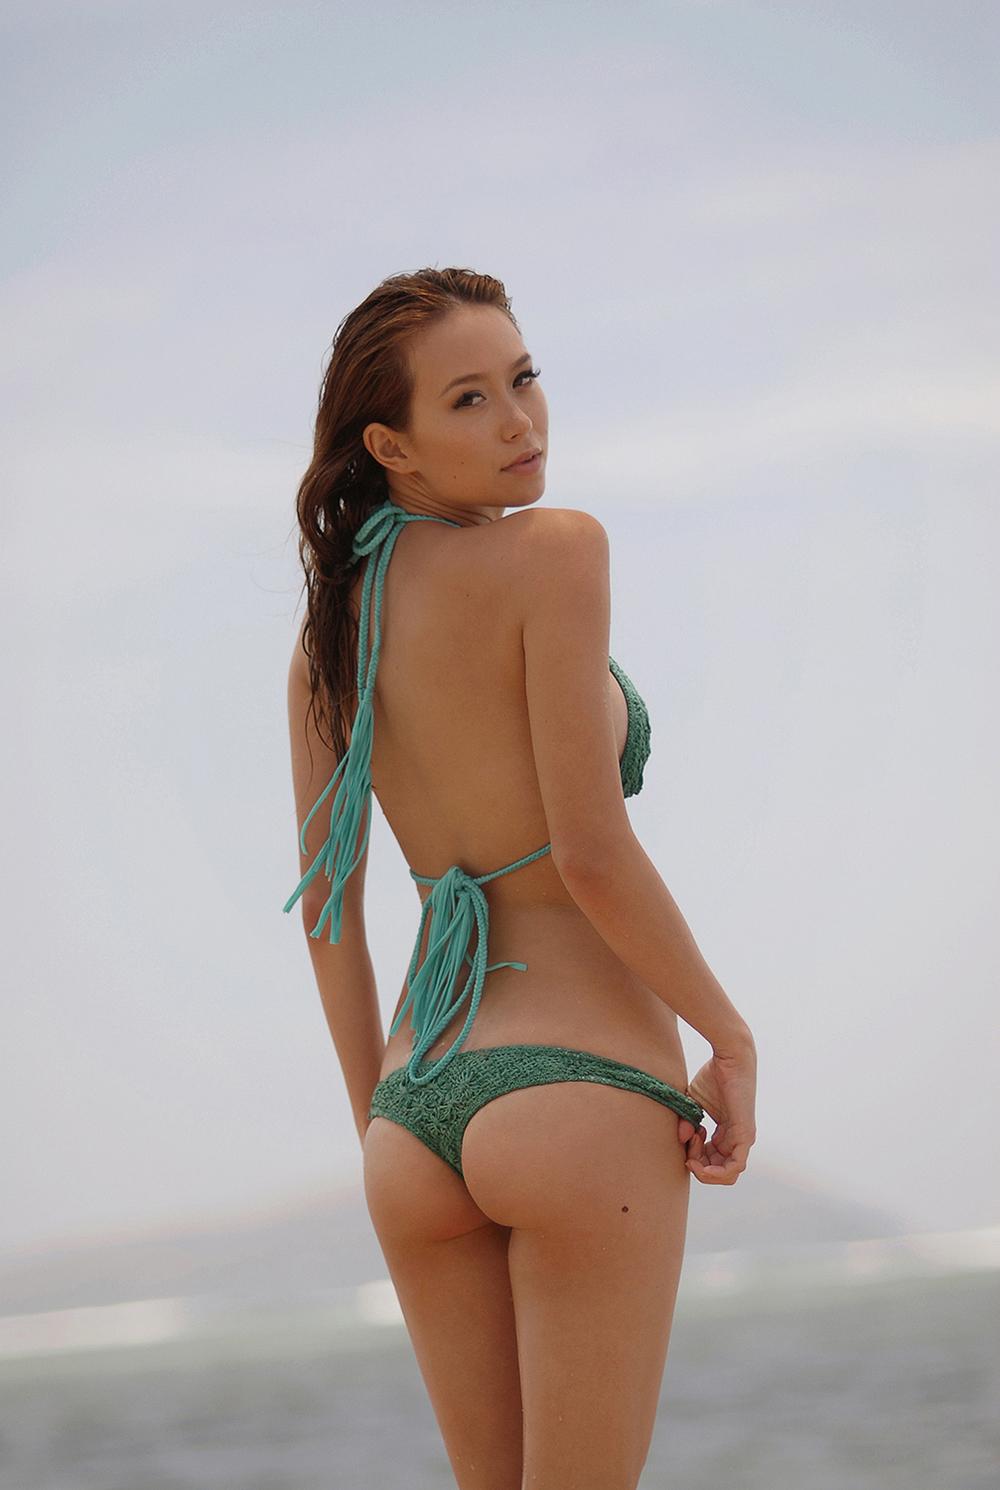 Swimbook_swimsuit_Rove_Jollie_Reve_Bohemia_Marlie_Hinshaw_DSC_0979.jpg